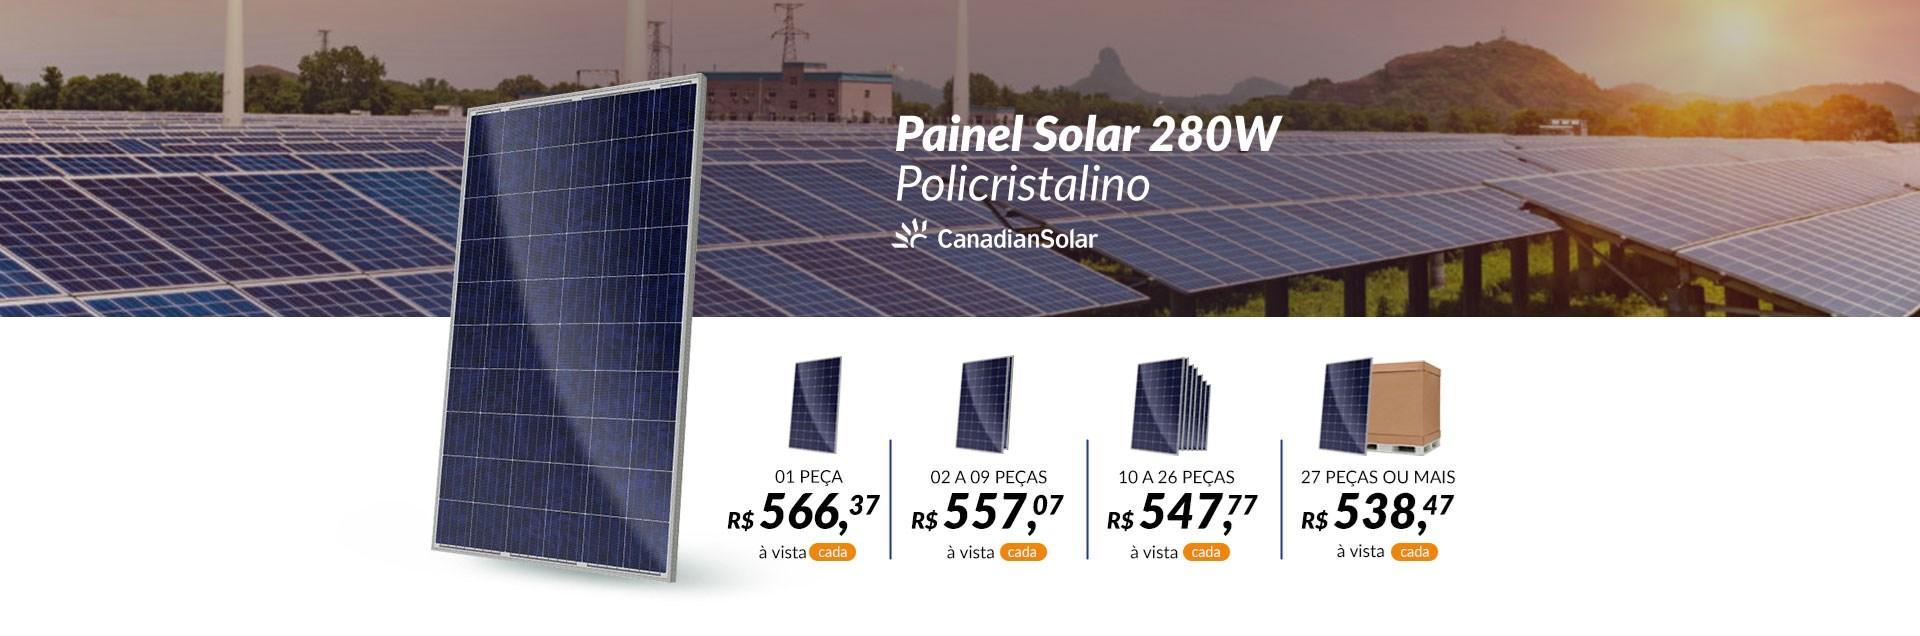 Painel 280W Canadian Solar